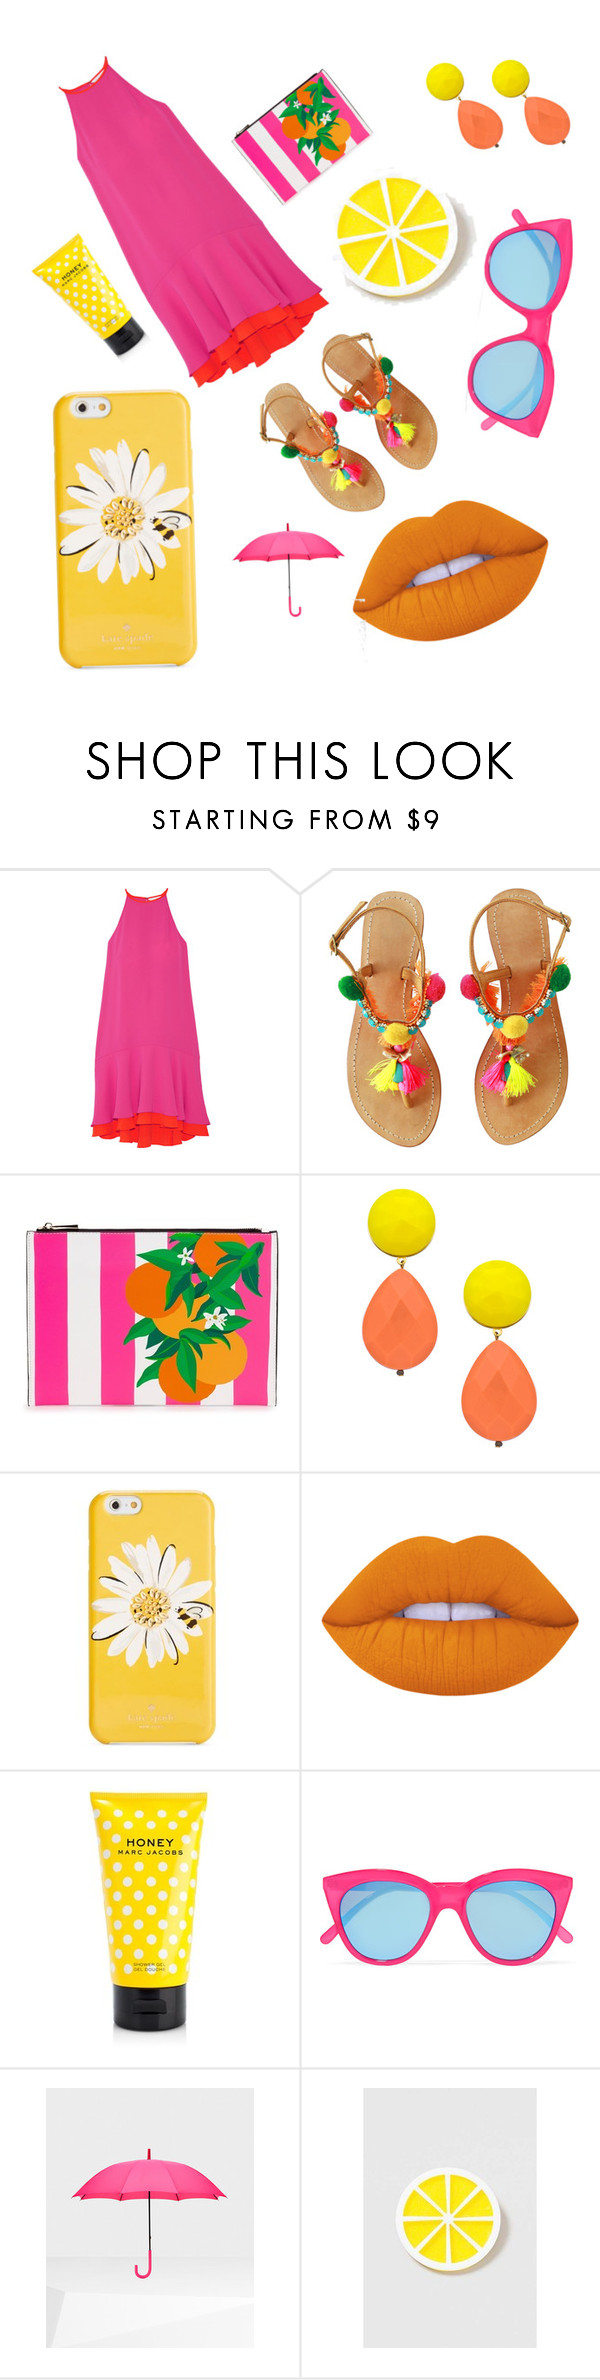 designer clothes shoes bags for ssense